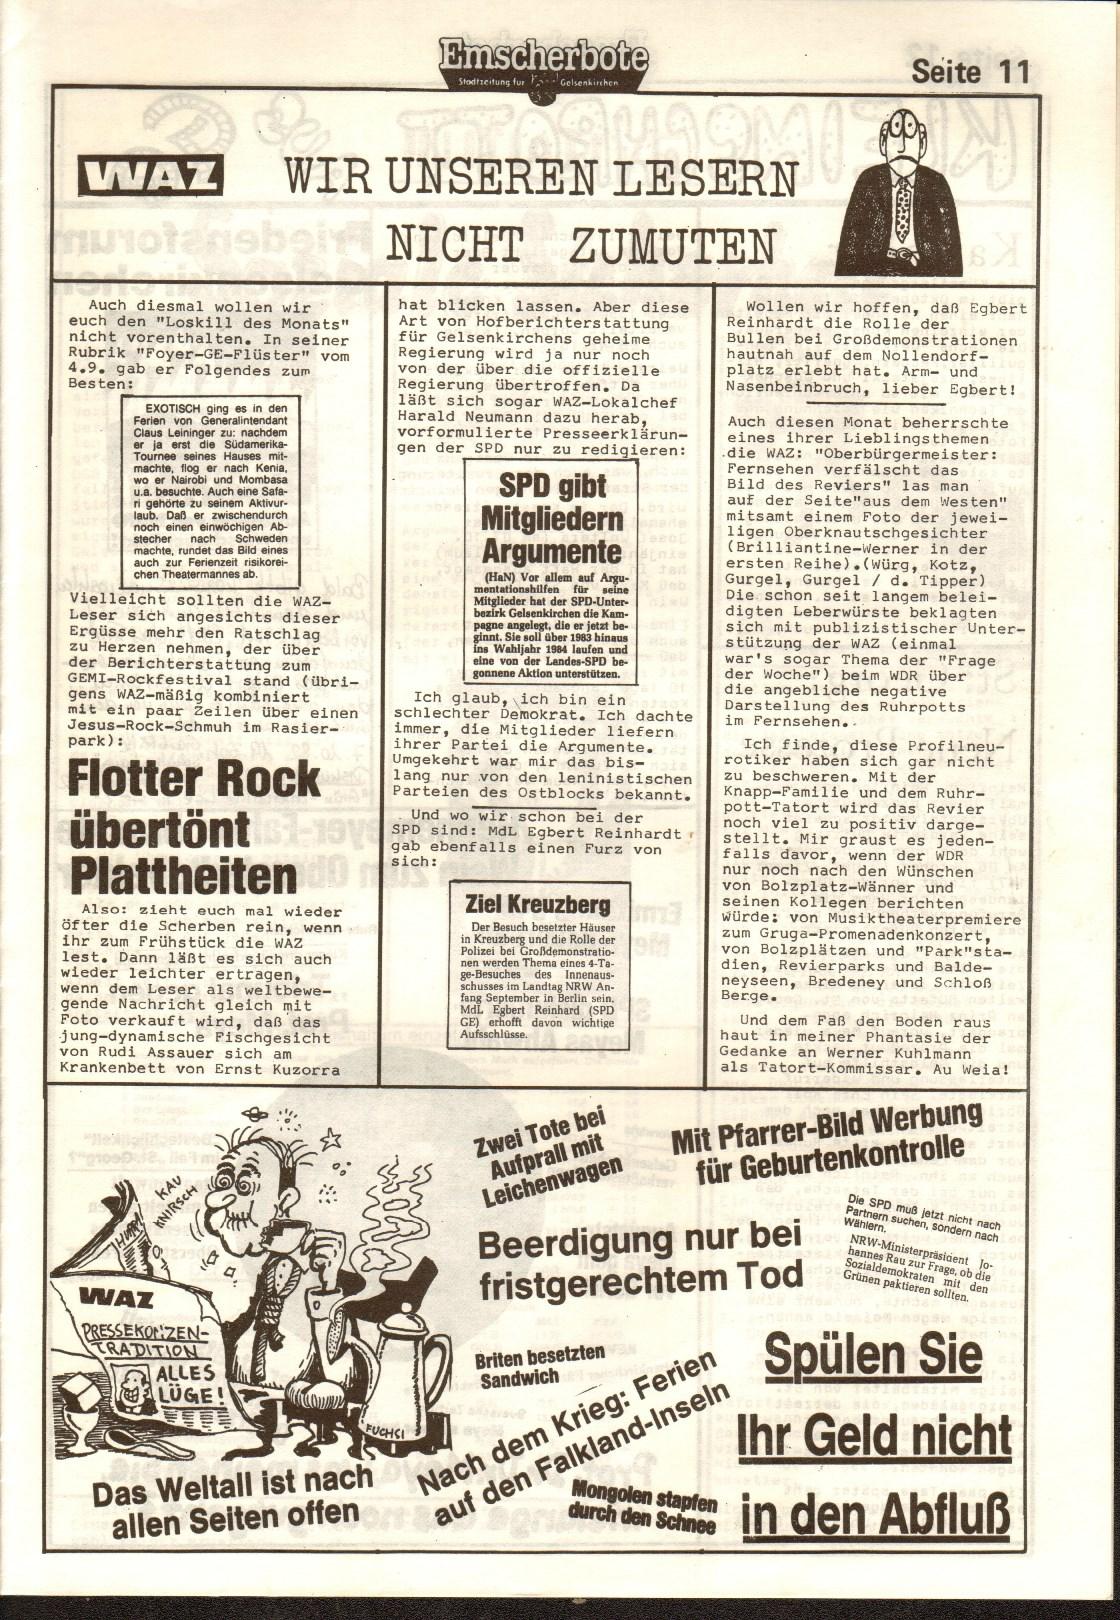 Gelsenkirchen_Emscherbote_1982_21_11